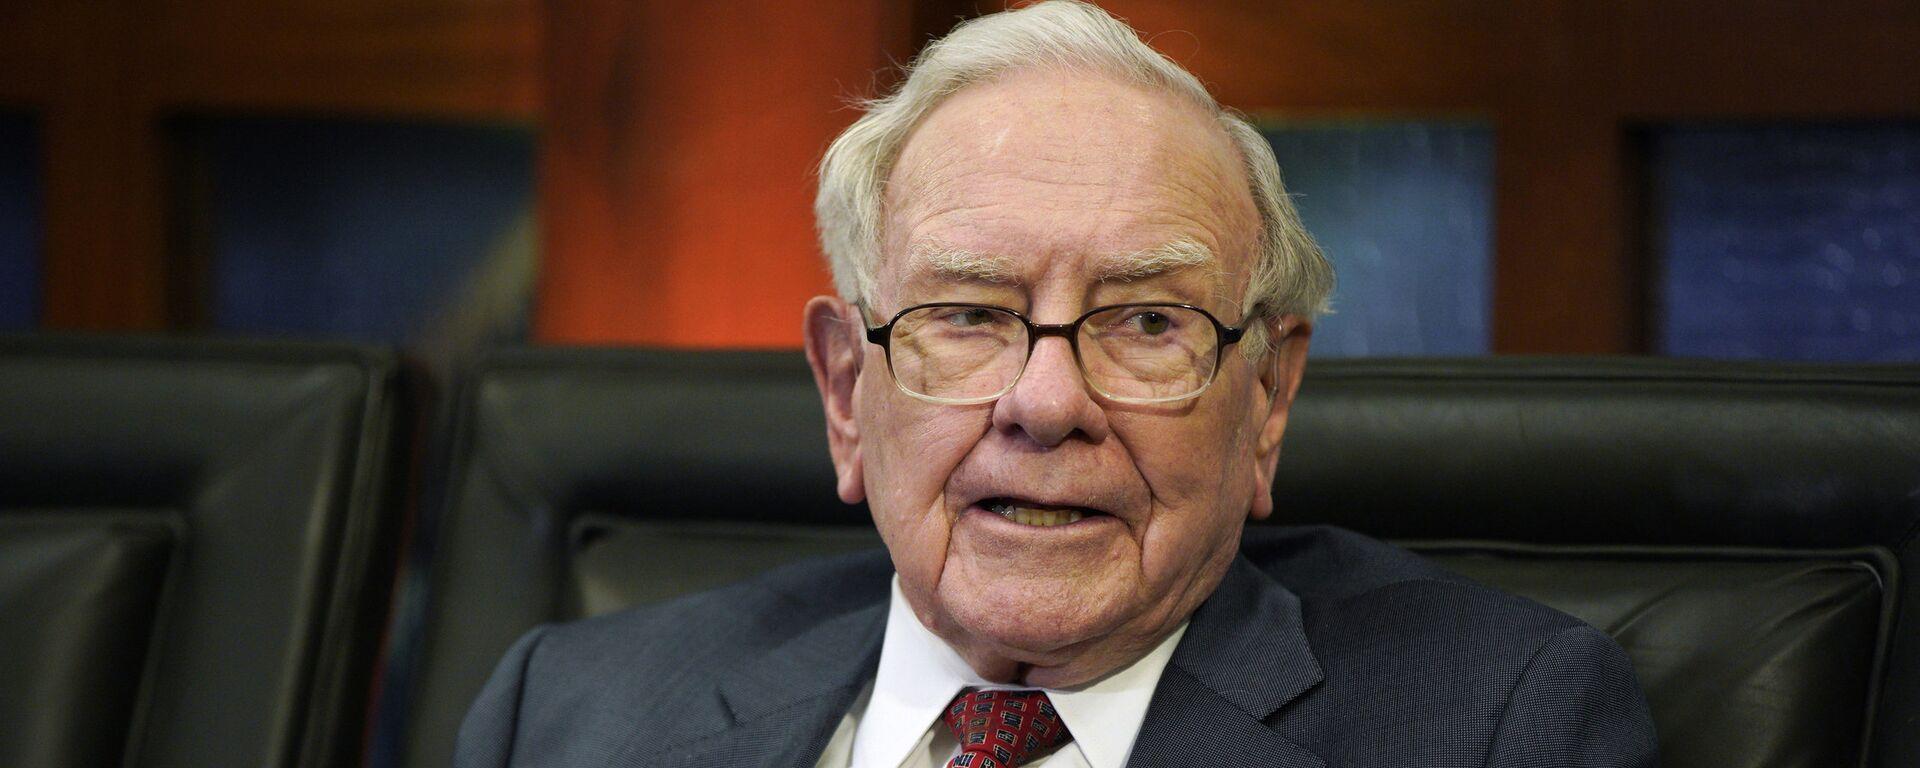 Warren Buffett, multimillonario estadounidense (archivo) - Sputnik Mundo, 1920, 16.10.2020